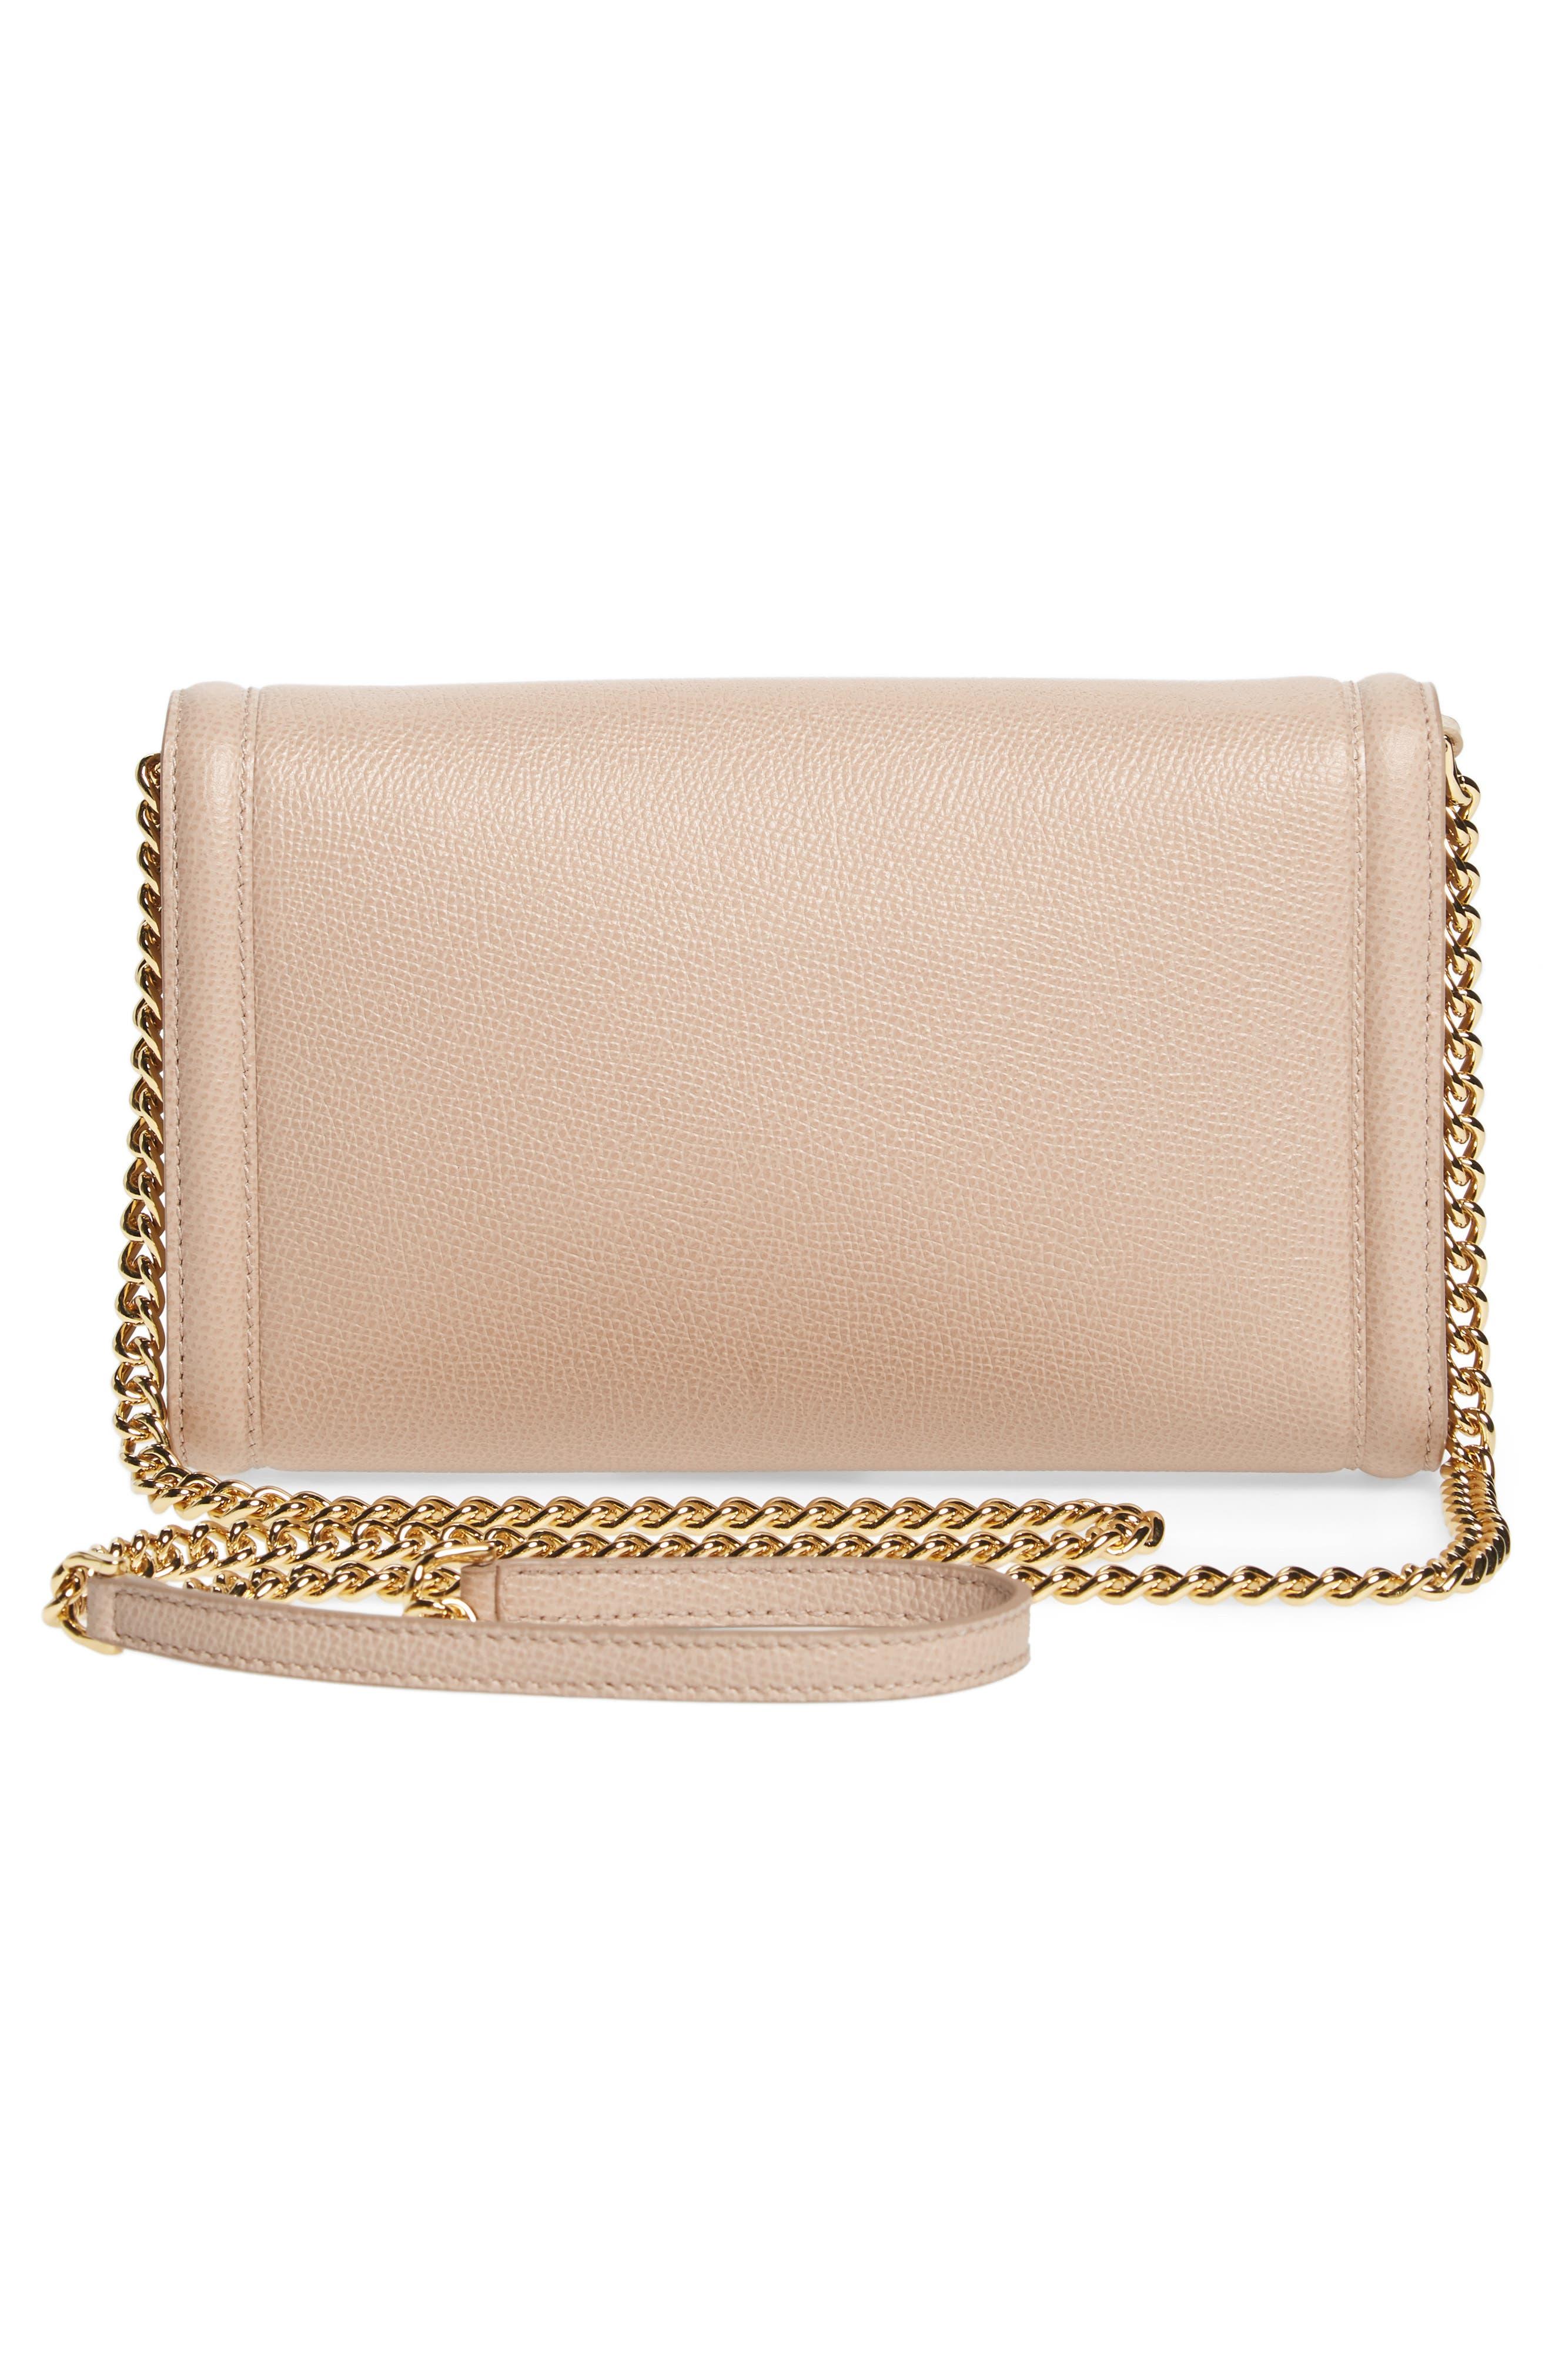 Alternate Image 3  - Salvatore Ferragamo Mini Vara Leather Crossbody Bag